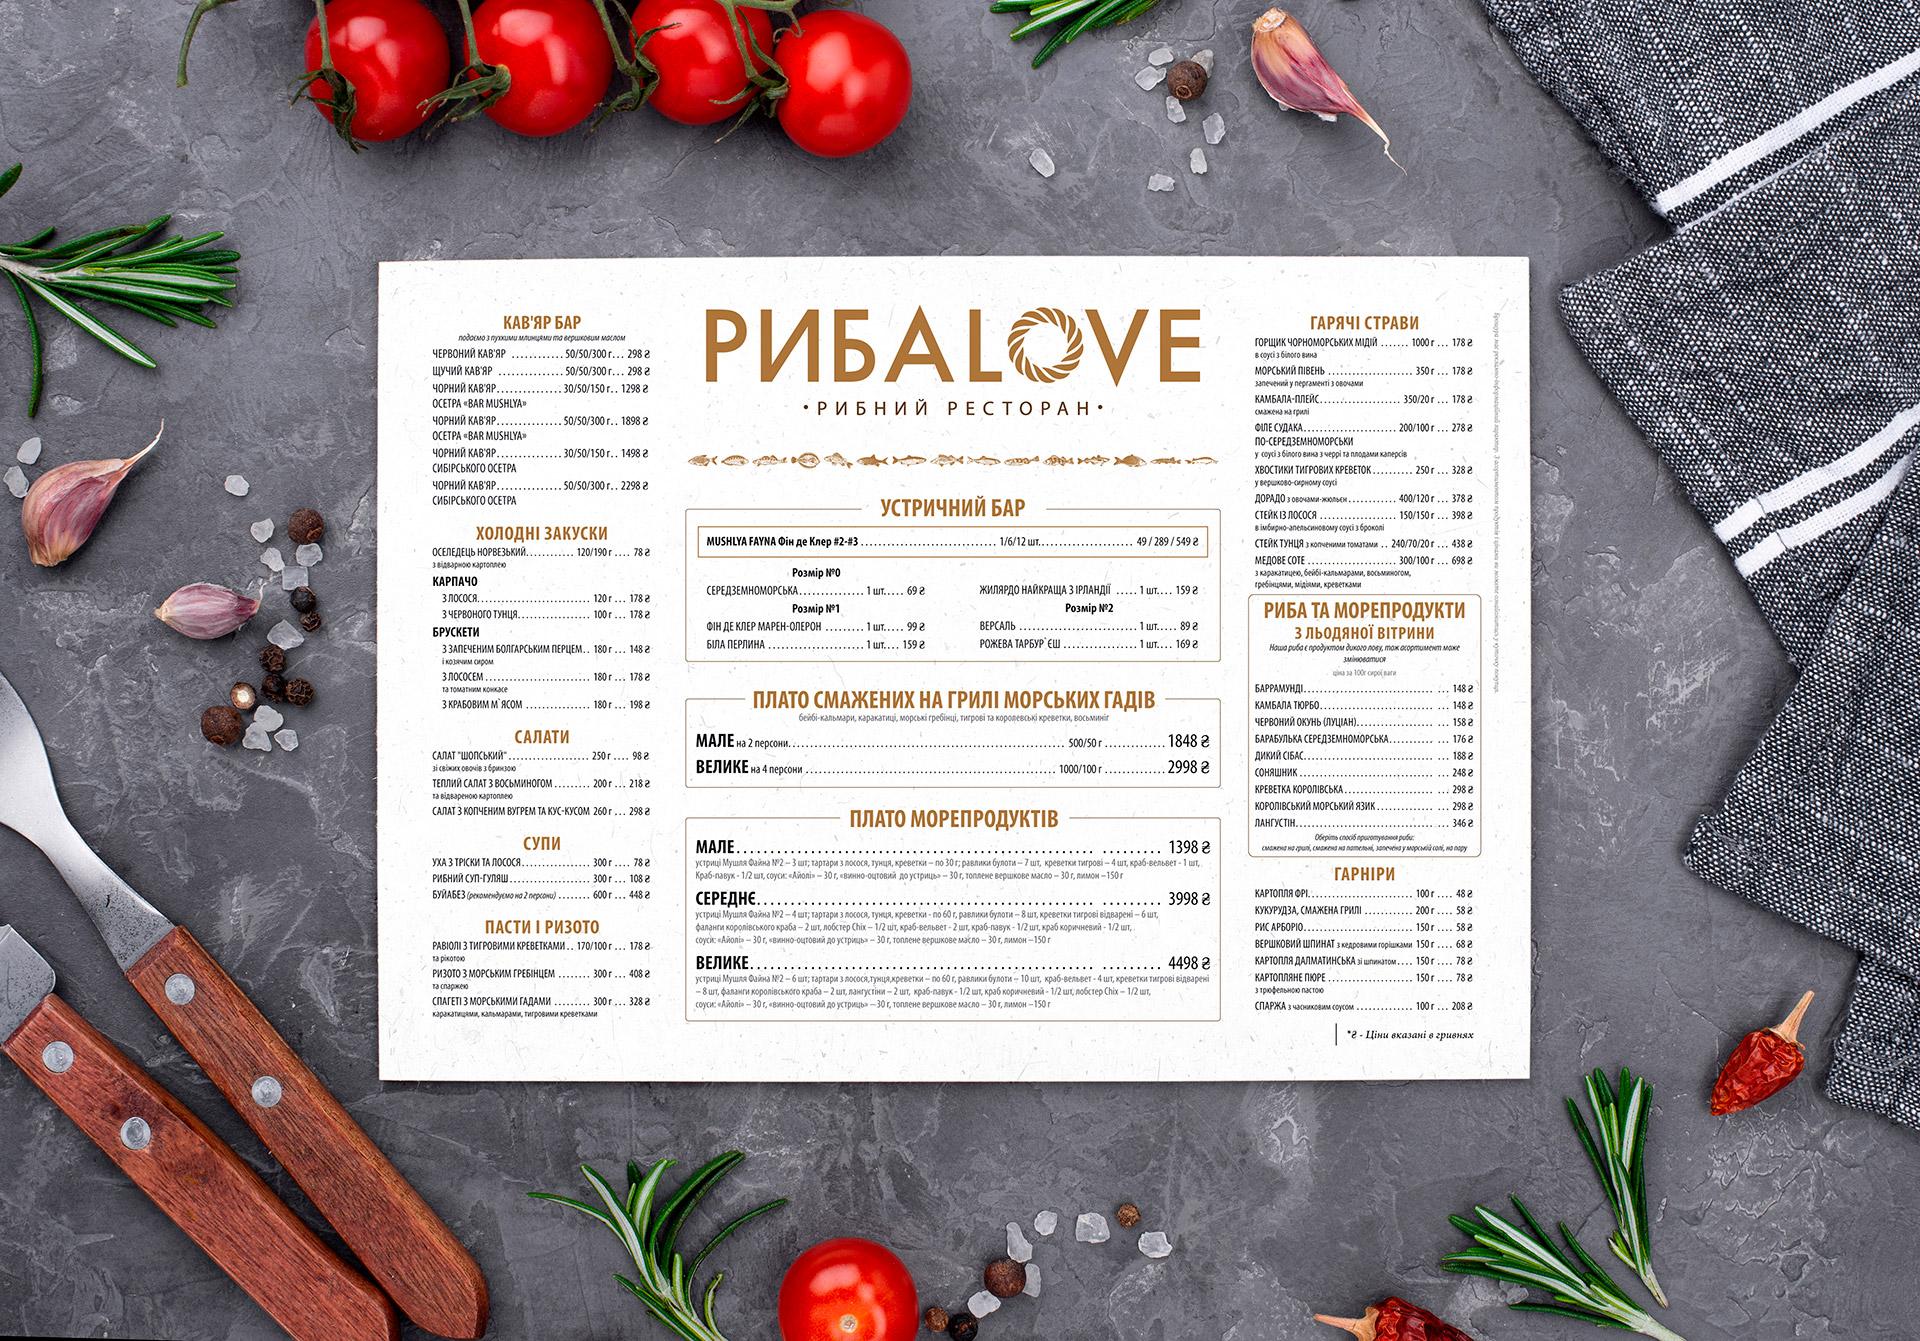 Розробка дизайну меню ресторан кафе Київ. РИБАLOVE, МЕНЮ